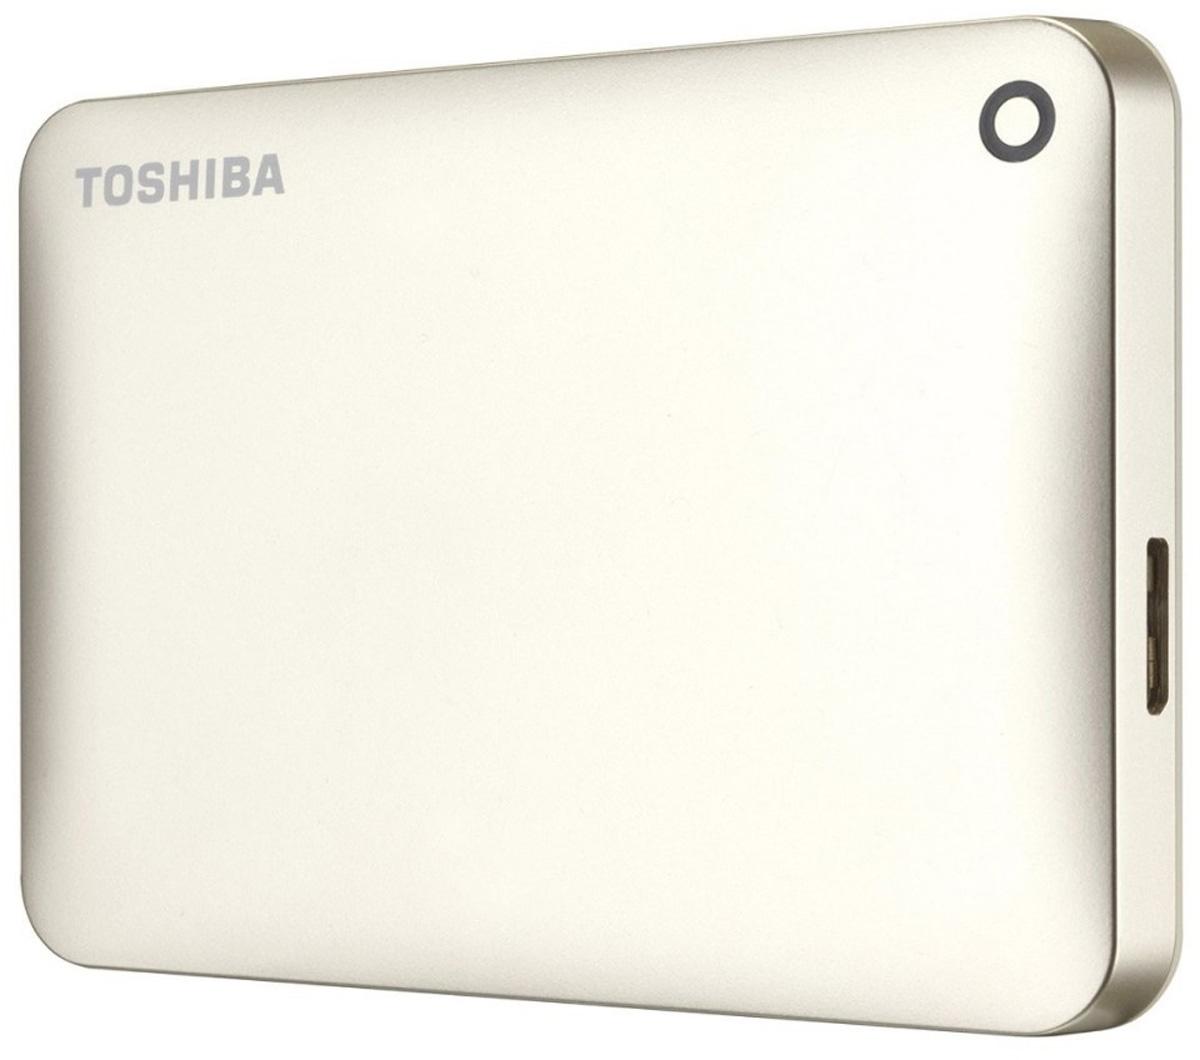 Toshiba Canvio Connect II 500GB, Gold внешний жесткий диск (HDTC805EC3AA)